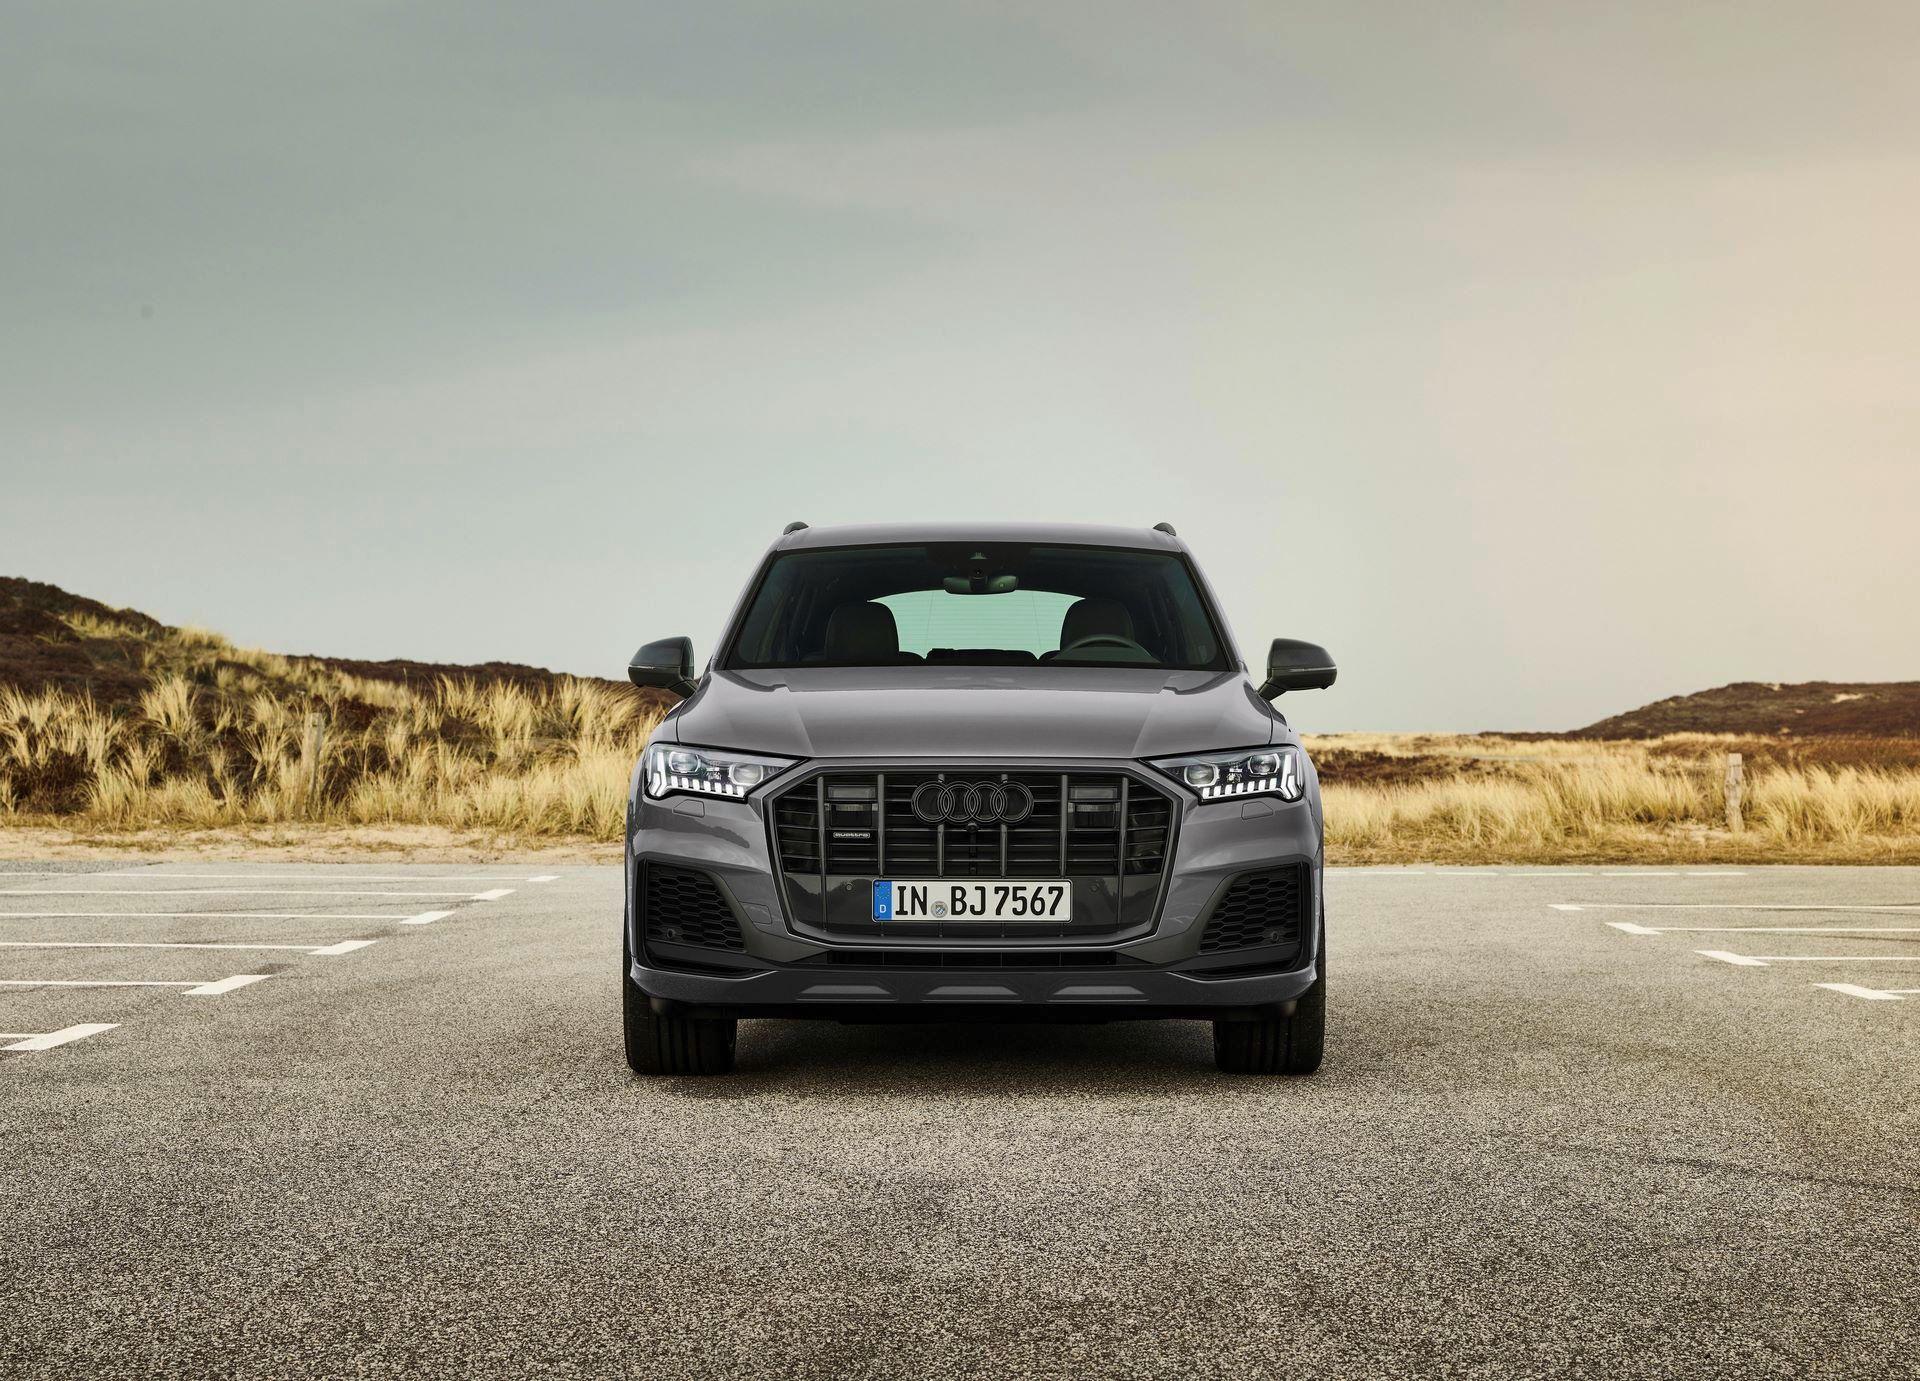 Audi-A4-A5-Q7-Q8-Competition-And-Competition-Plus-Trims-38